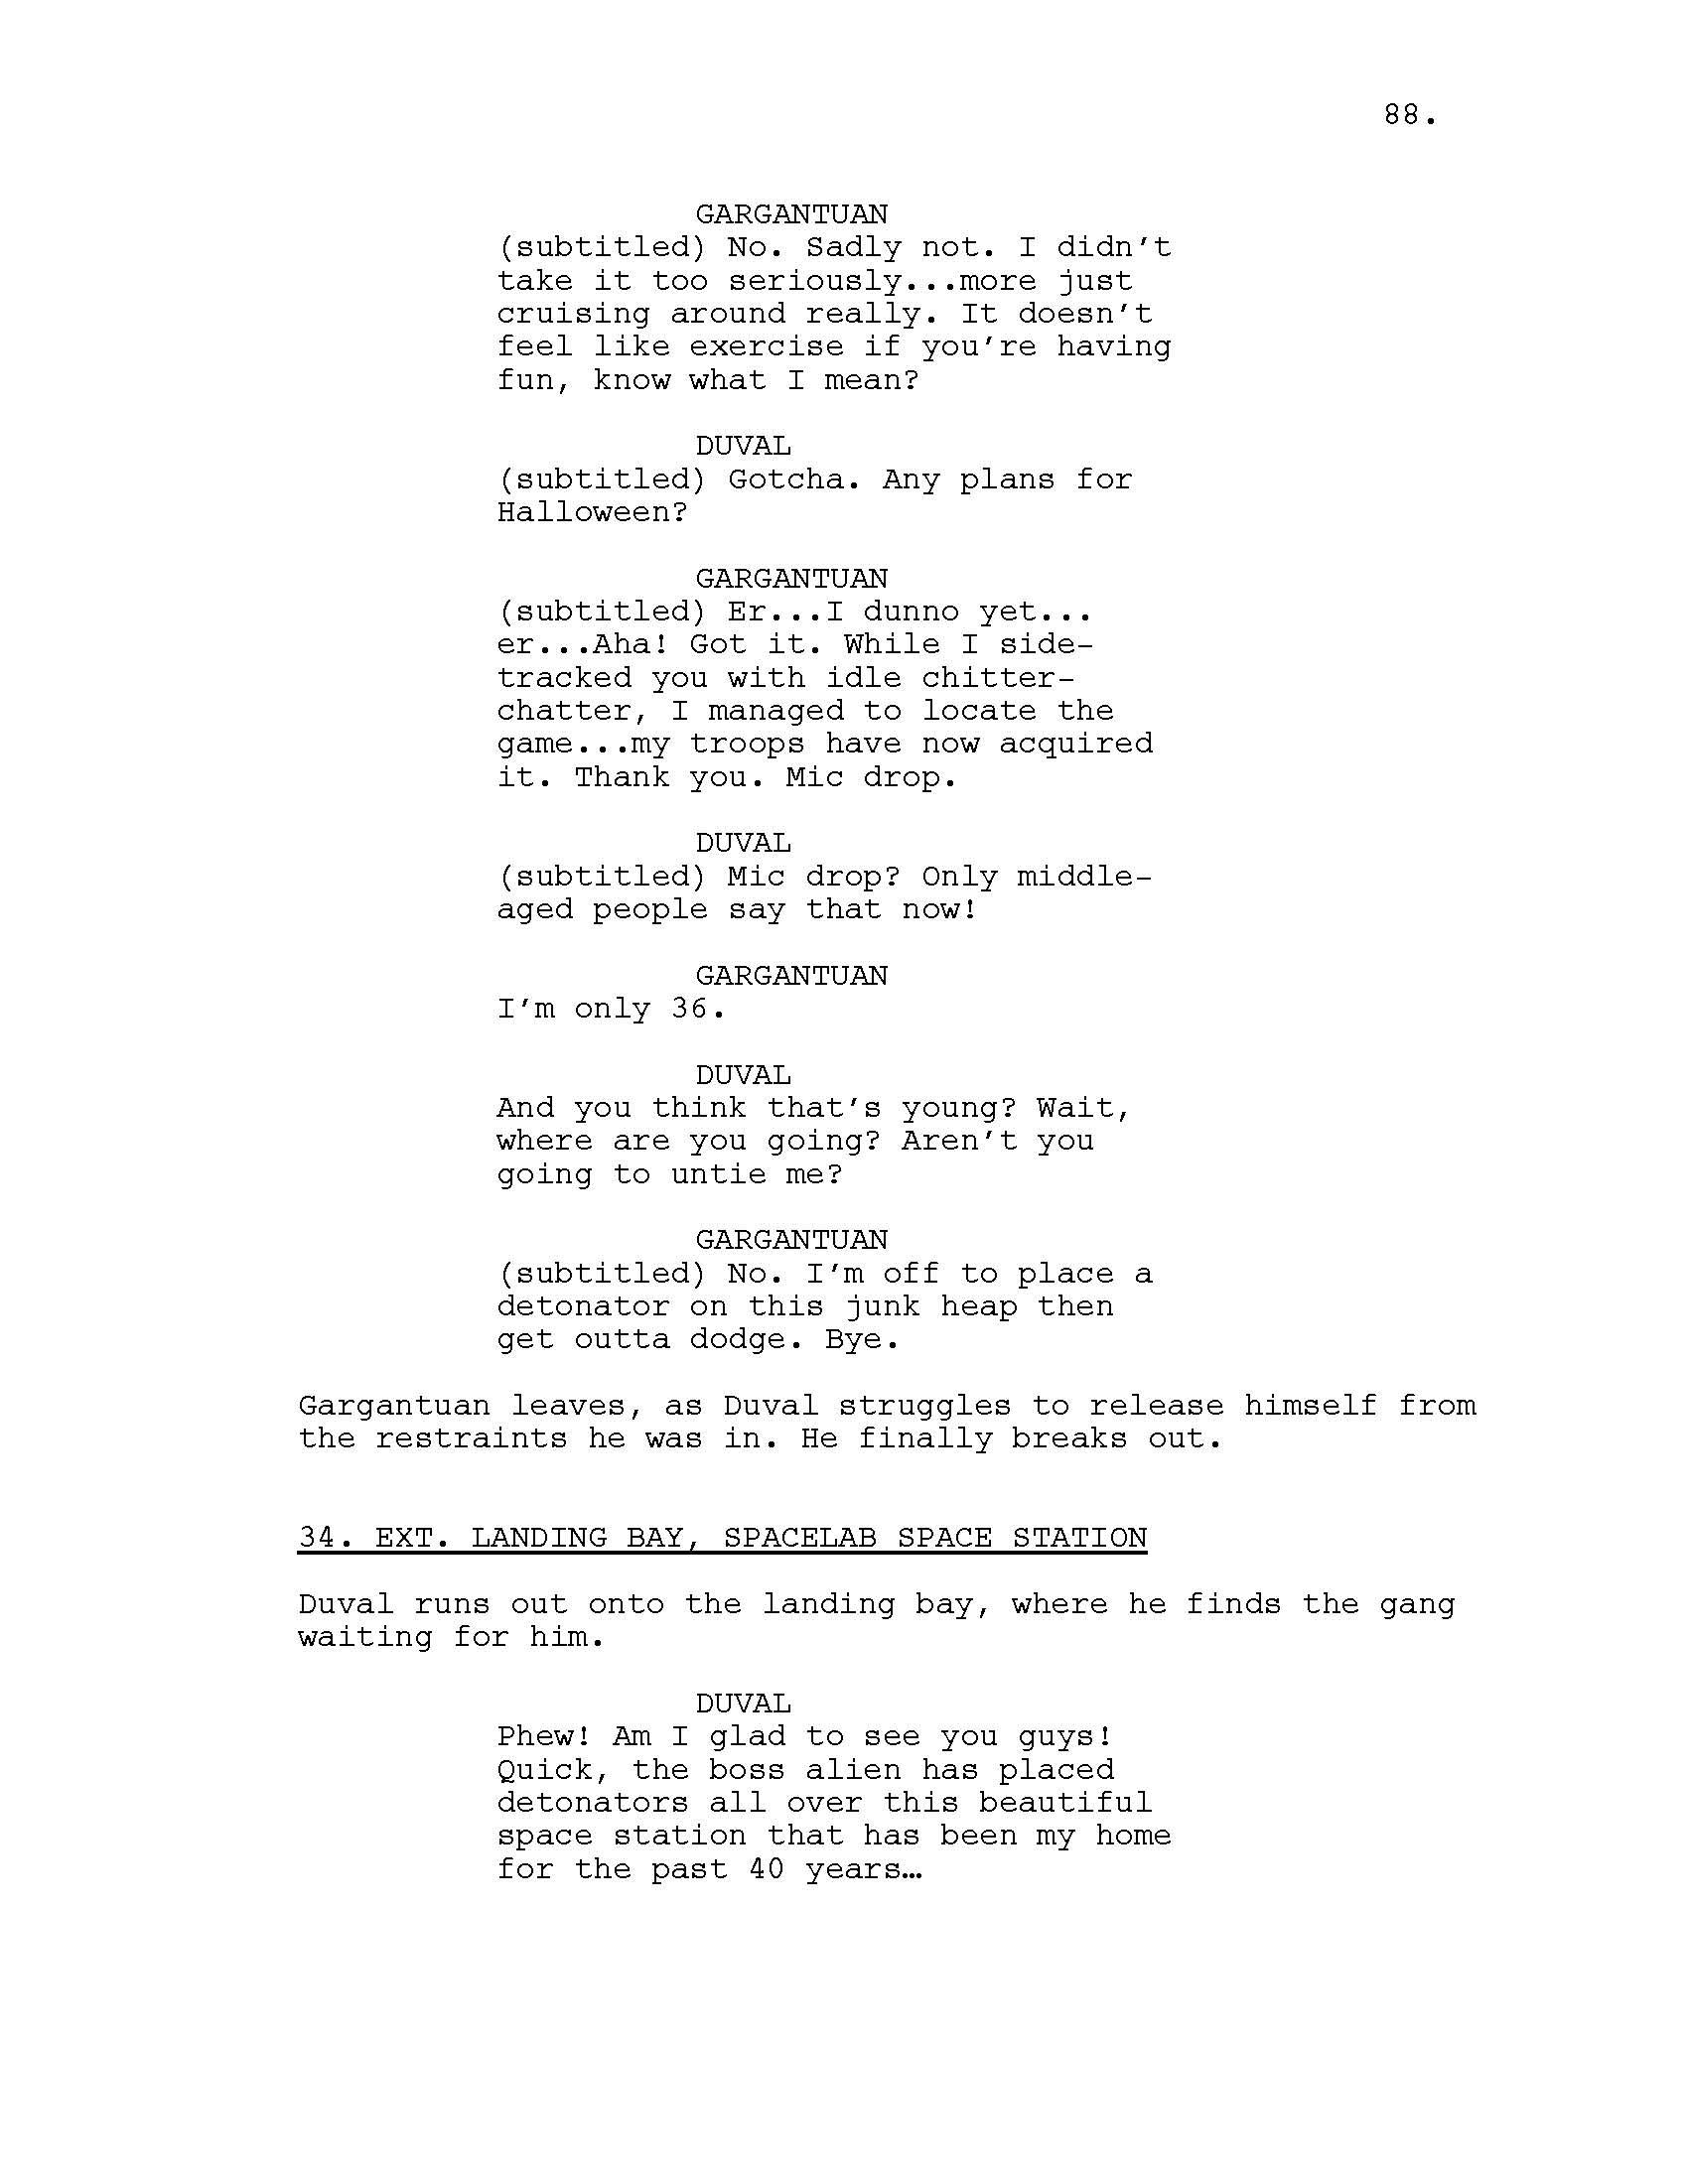 INVISIBLE WORLD SCRIPT_Page_089.jpg